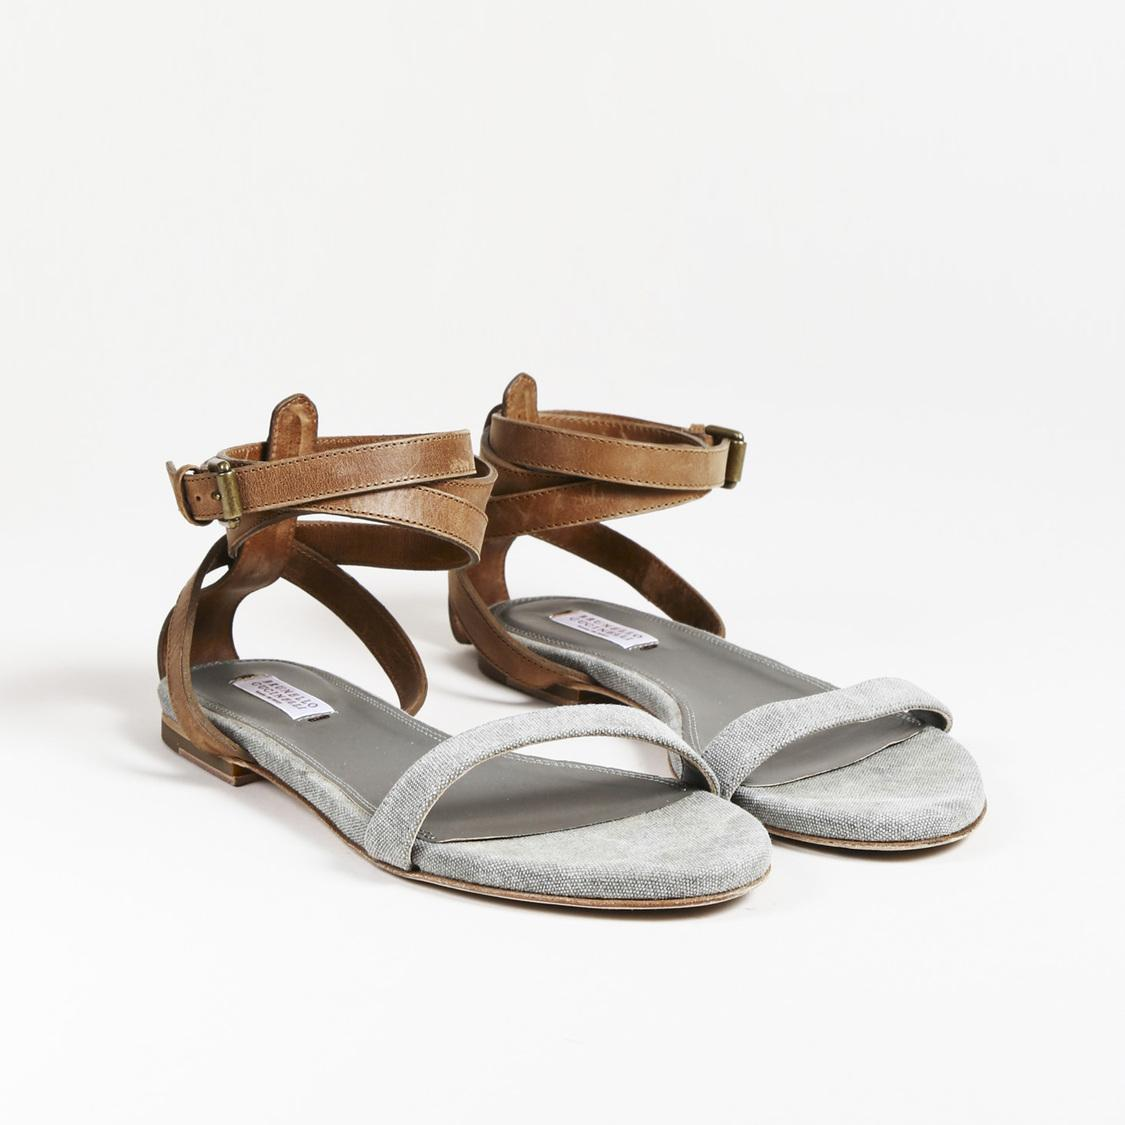 628033041e9 Brunello Cucinelli. Women s Gray   Brown Canvas   Leather Ankle Wrap Sandals